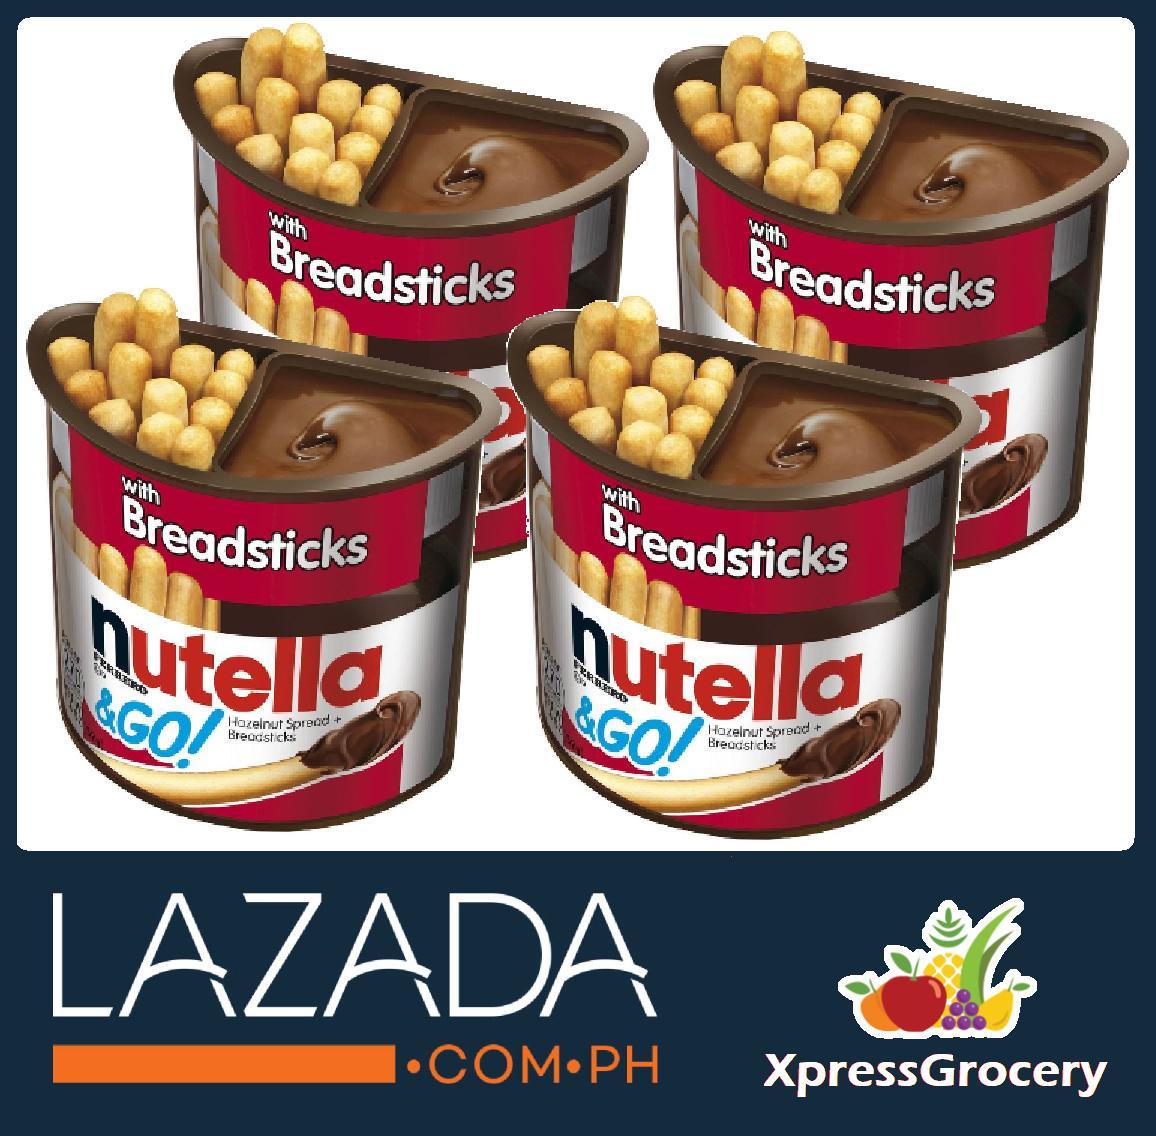 [XG] NUTELLA & GO Chocolate Breadsticks 52g 1 8oz 4pcs